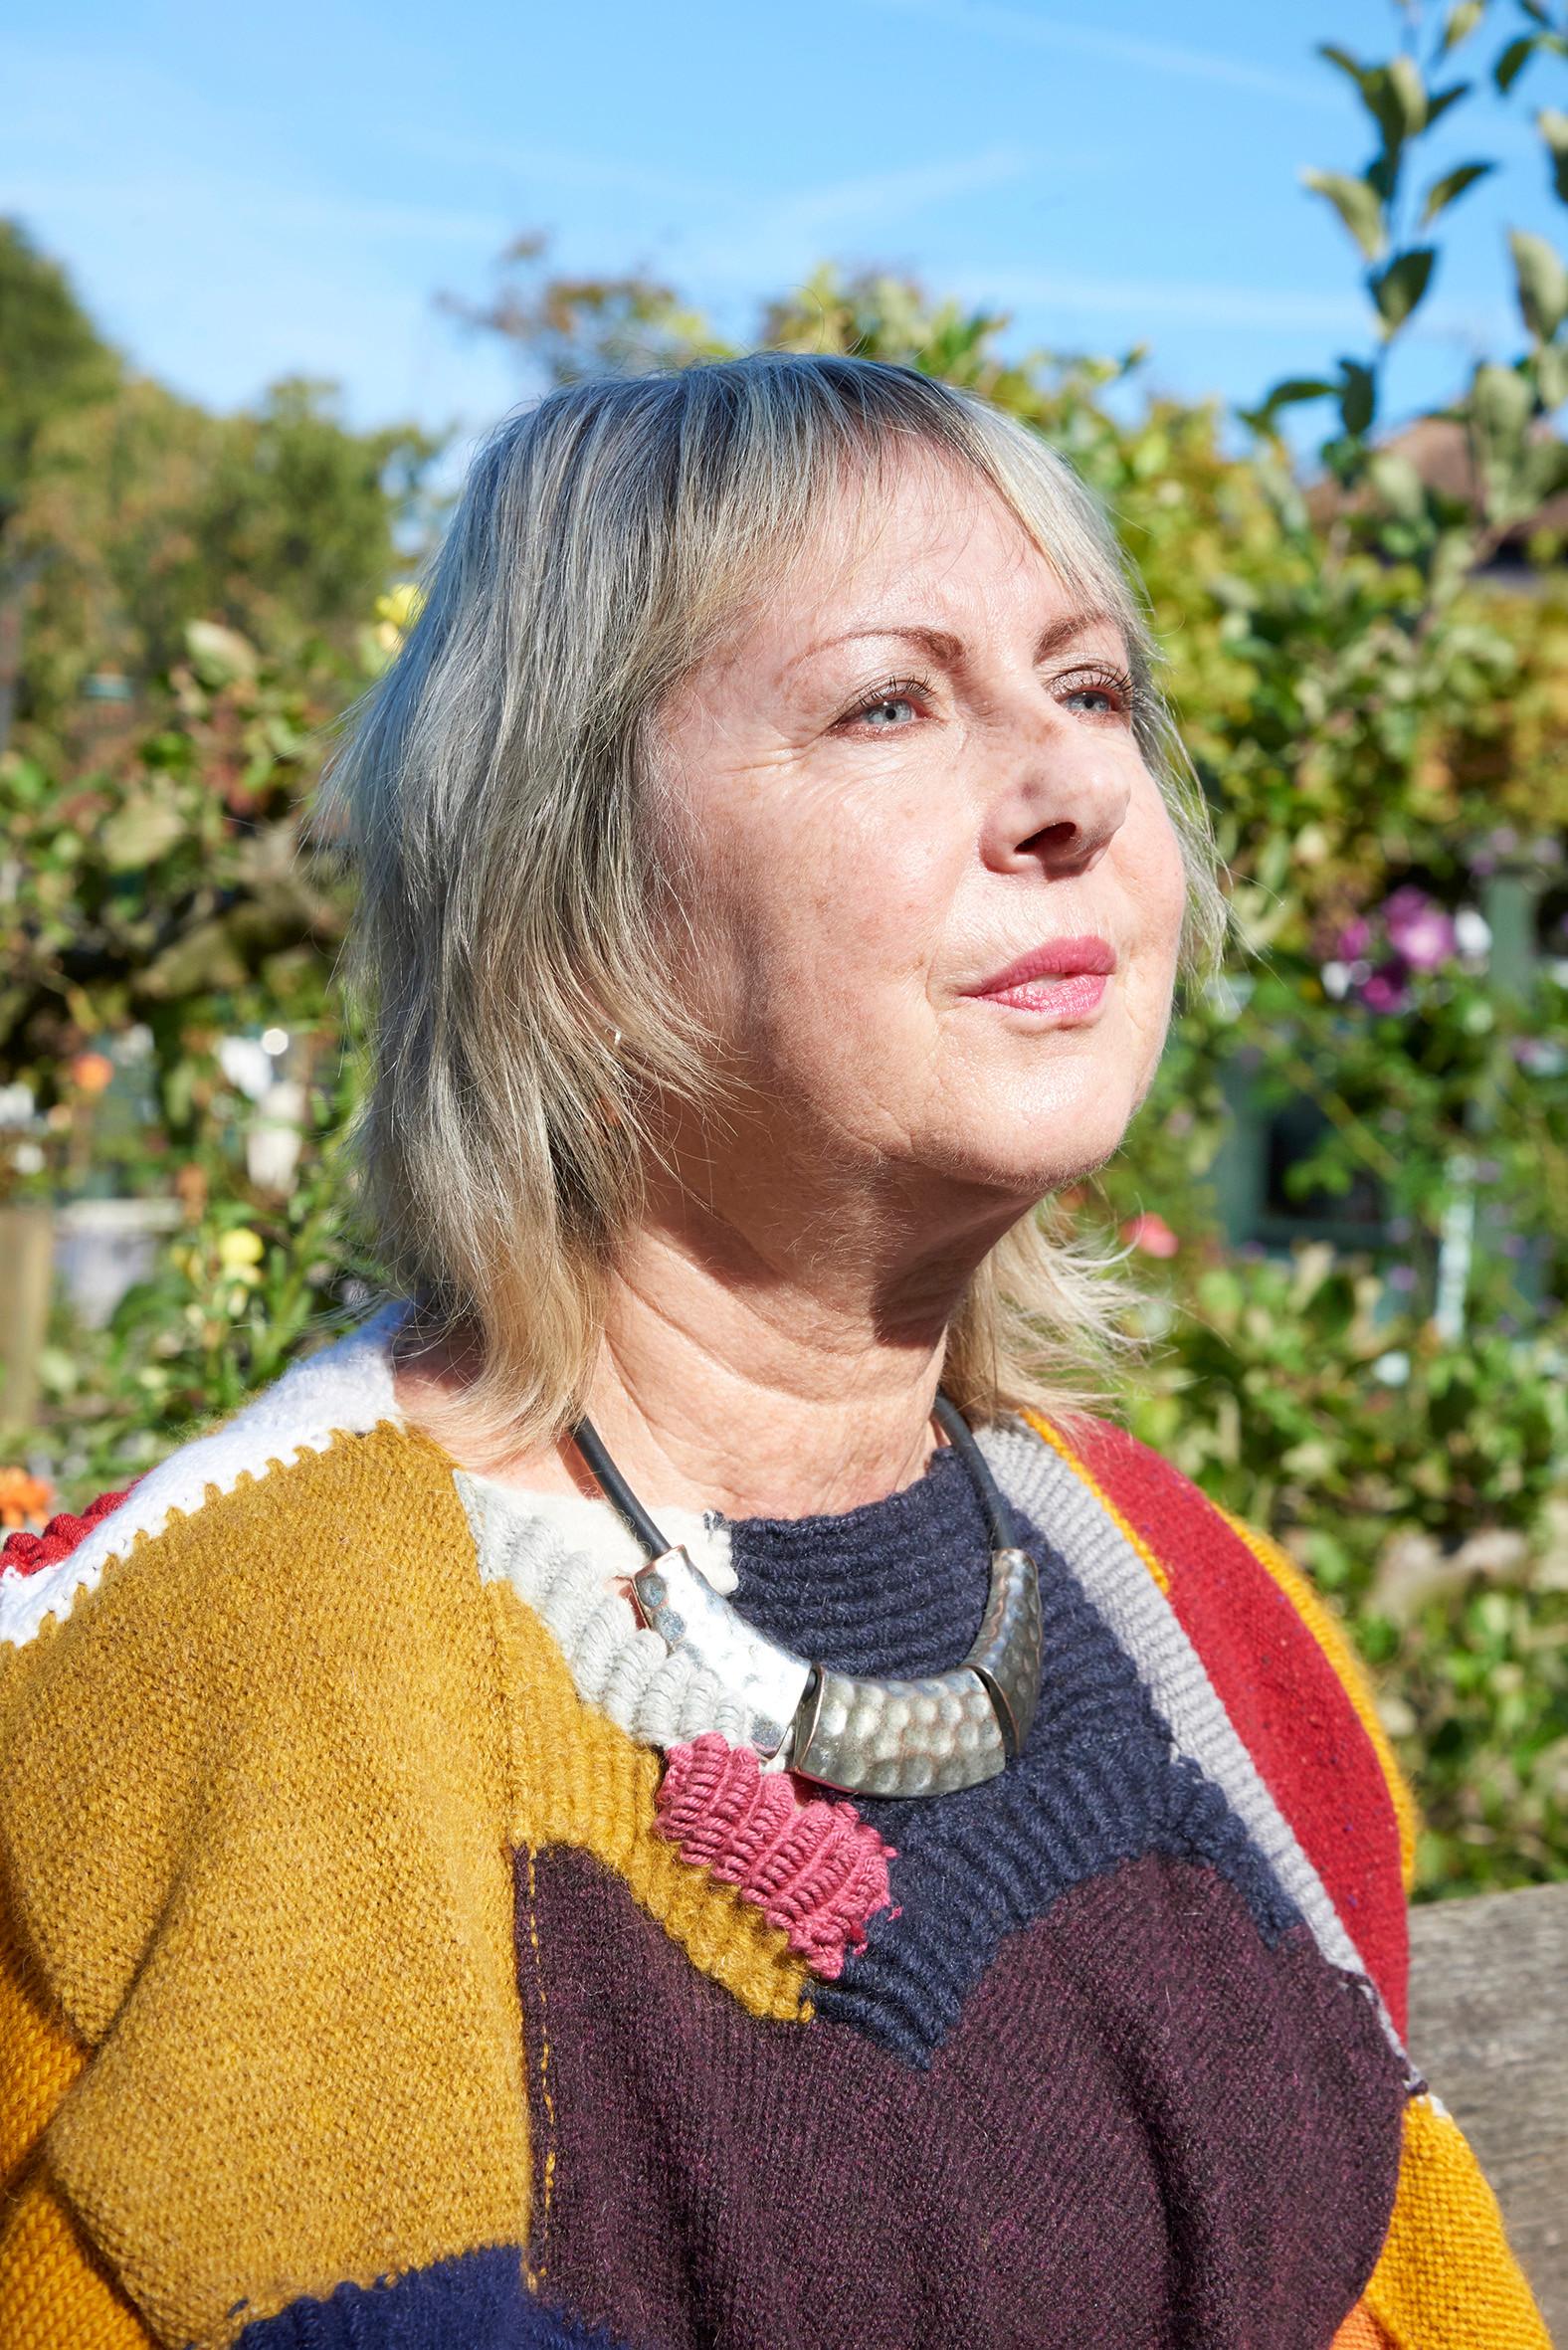 TANYA HOUGHTON